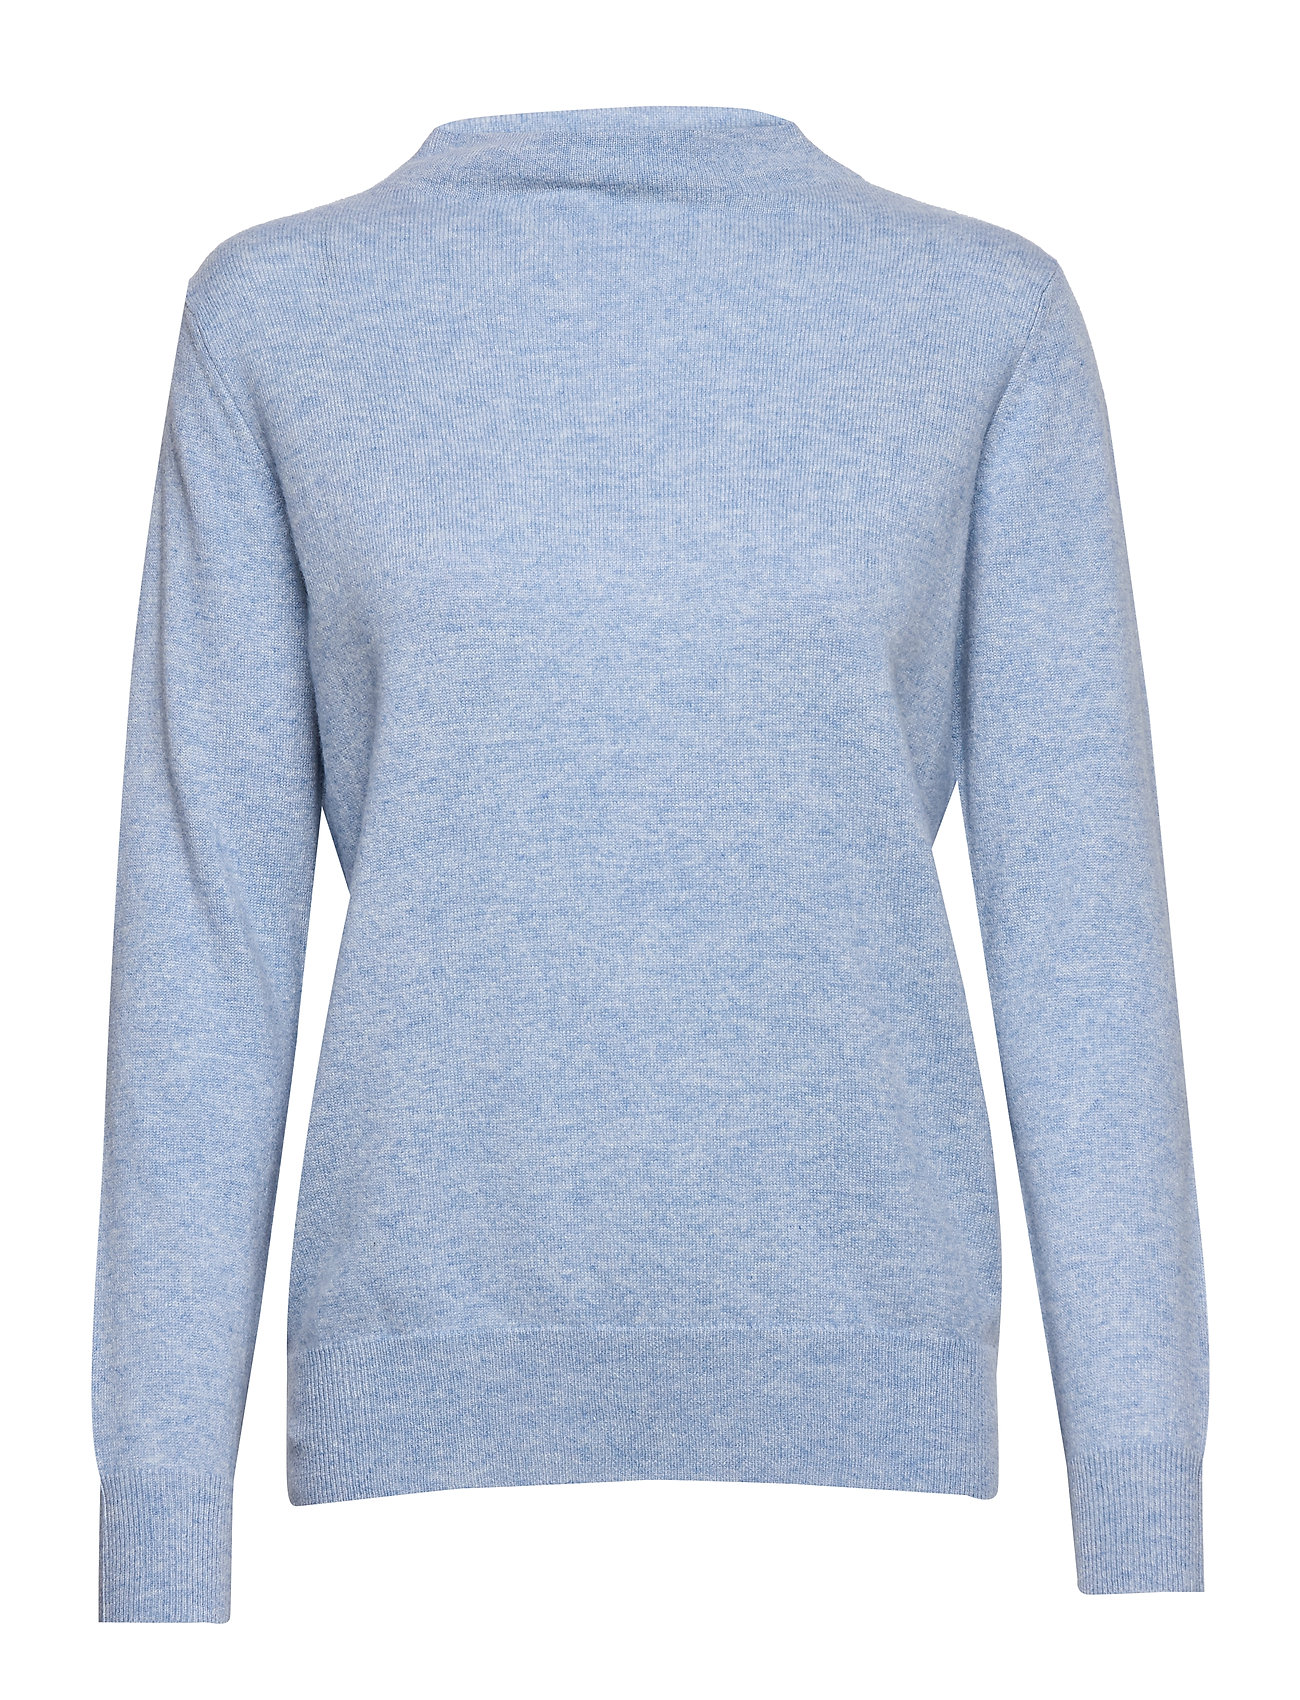 Davida Cashmere Funnel Neck Sweater - LIGHT BLUE